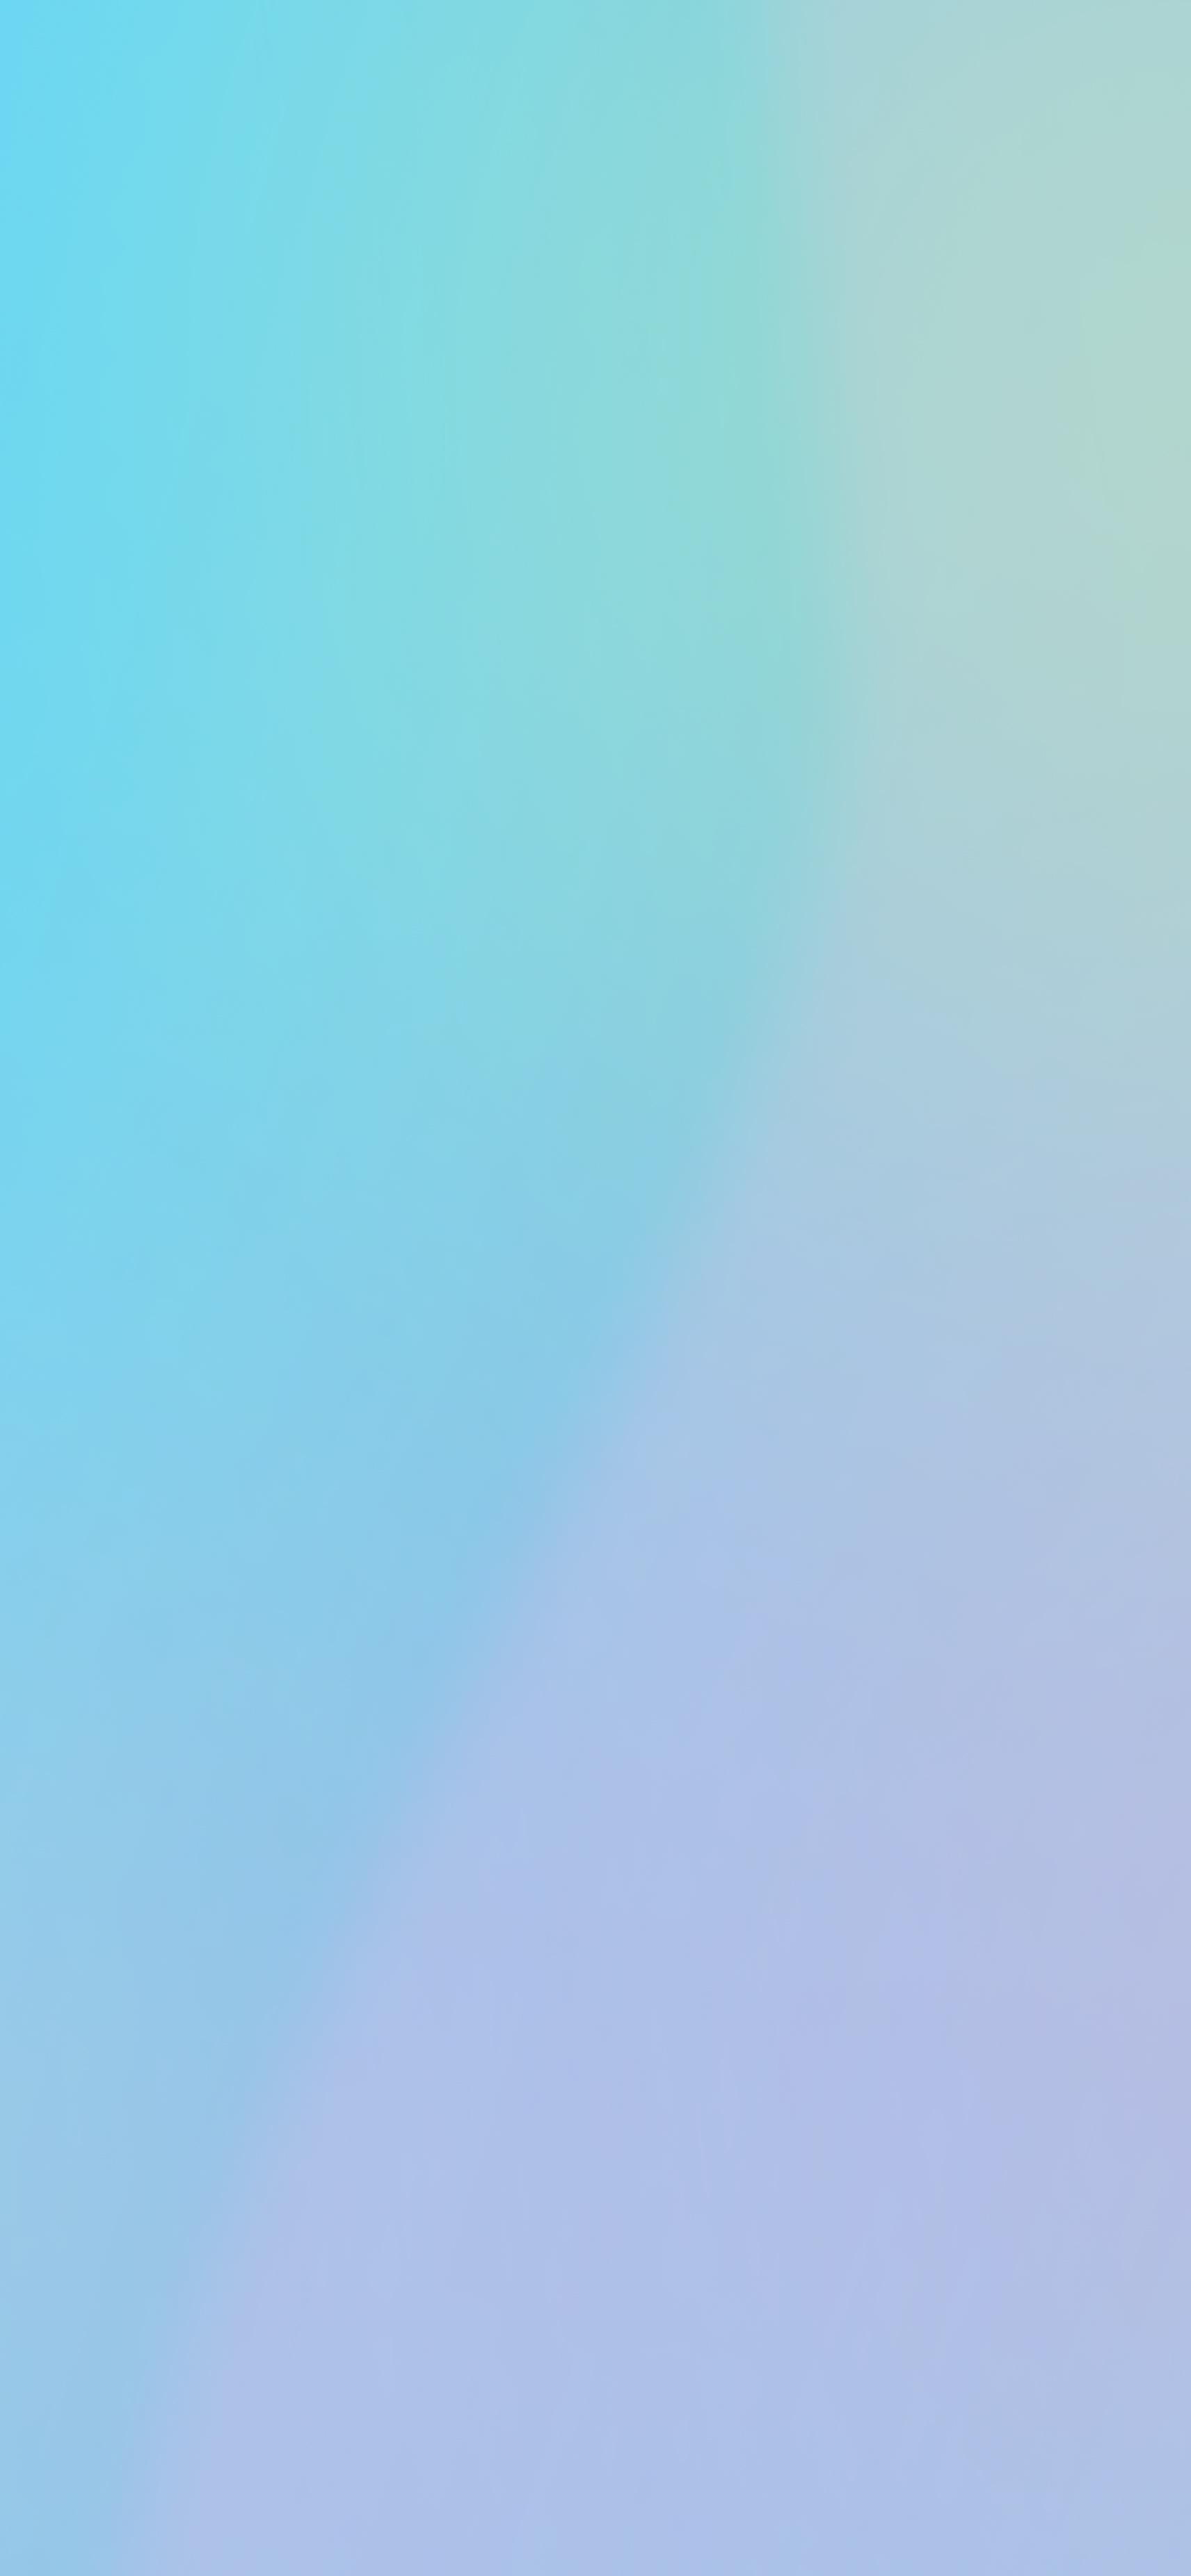 abstract gradient wallpaper iPhone mattbirchler idownloadblog light purple